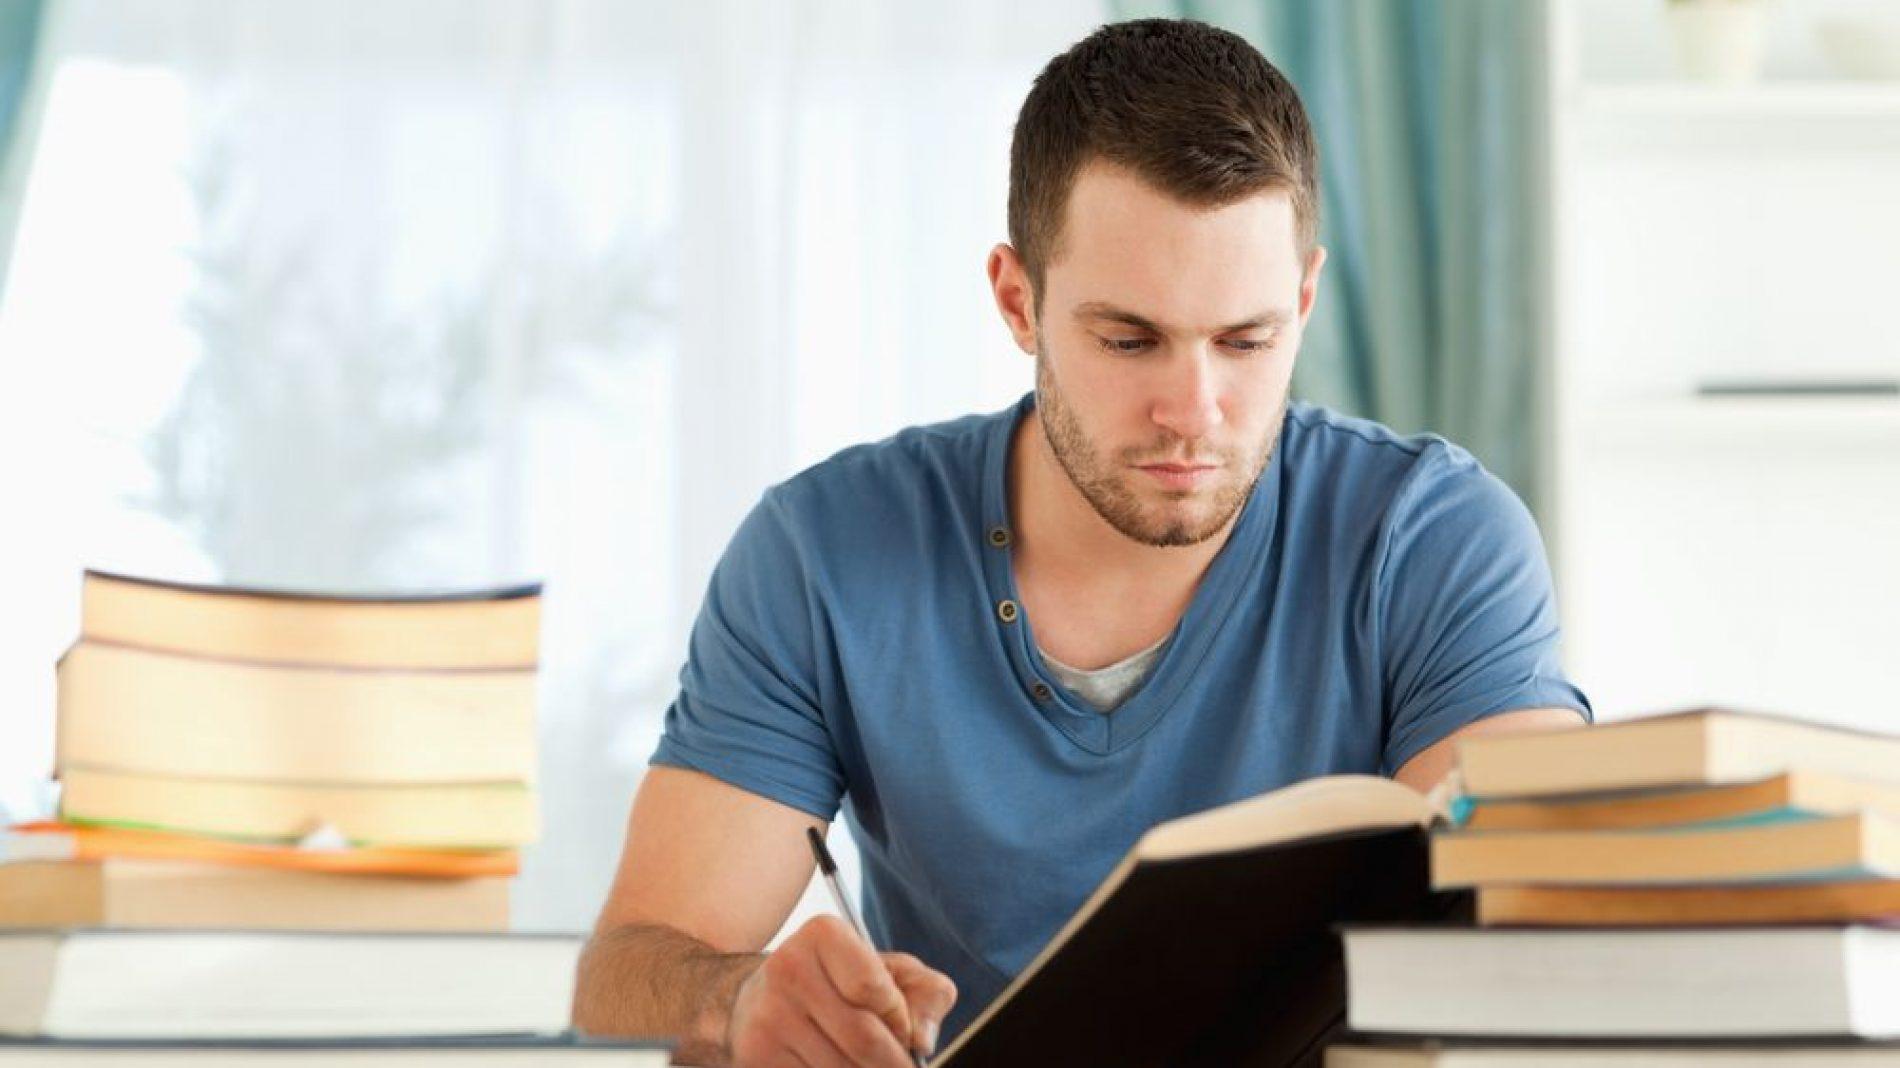 Man-studying-books